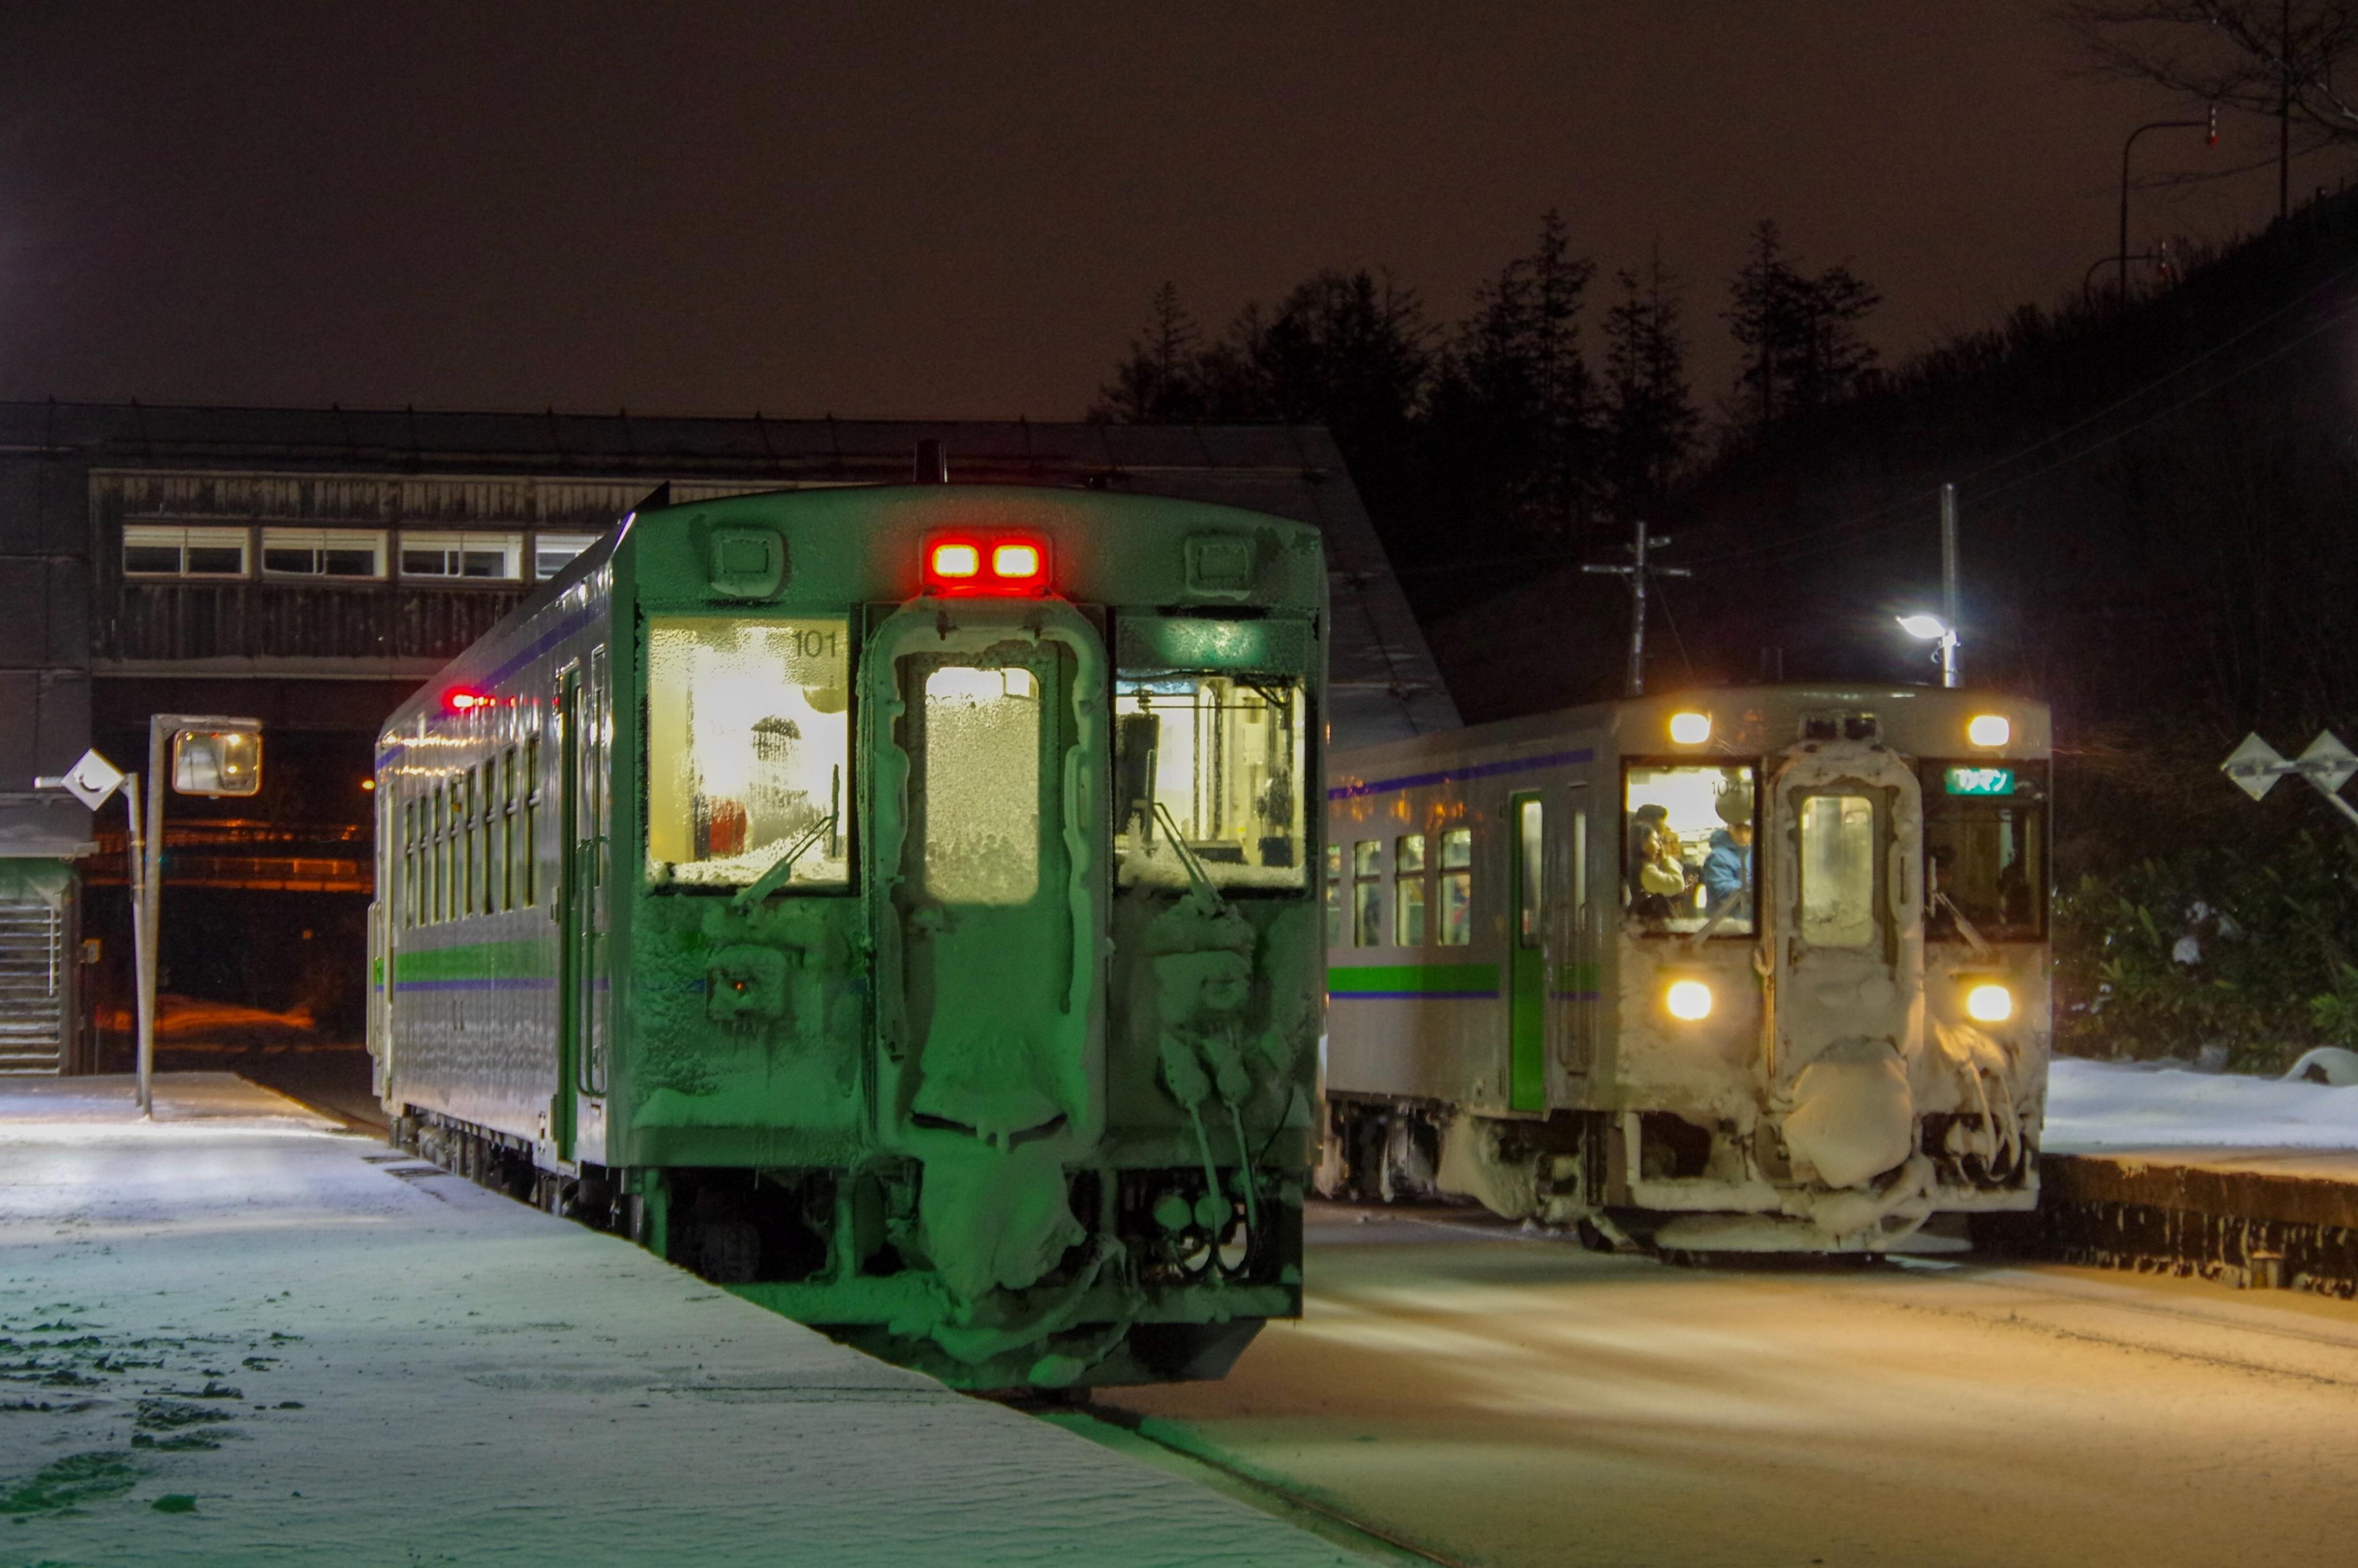 キハ150列車交換 塩谷駅_191208.JPG